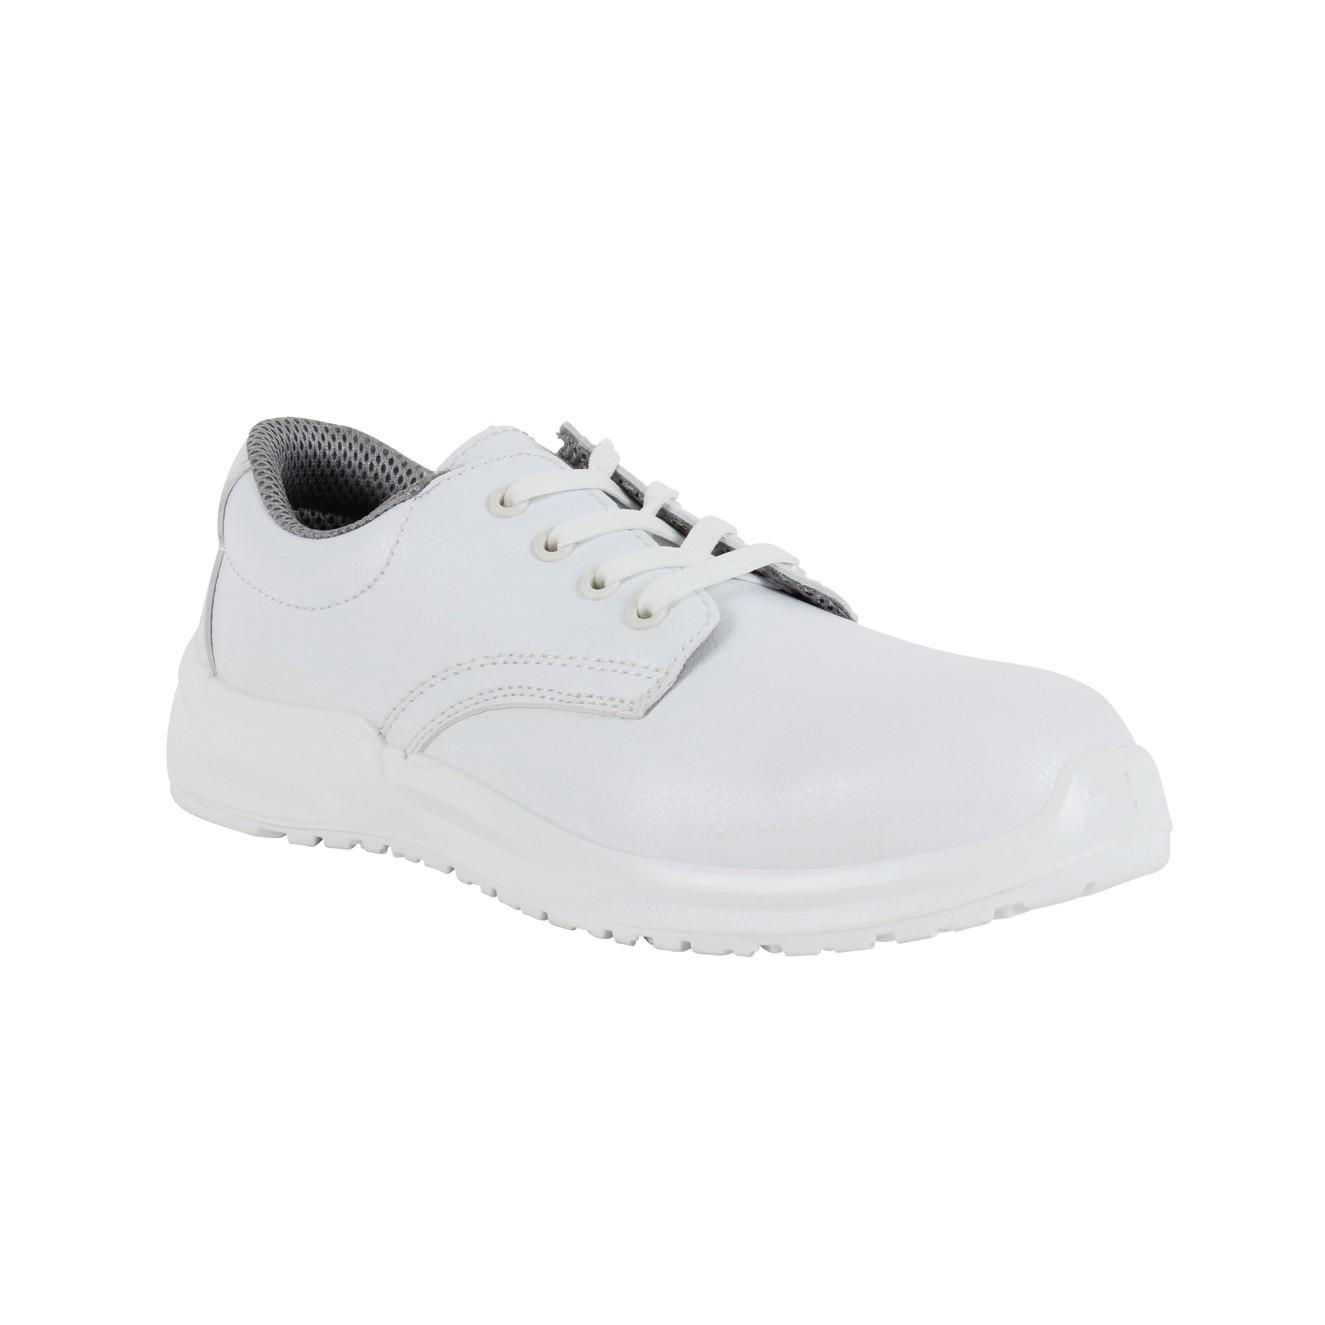 Hygiene Lace-Up Shoe